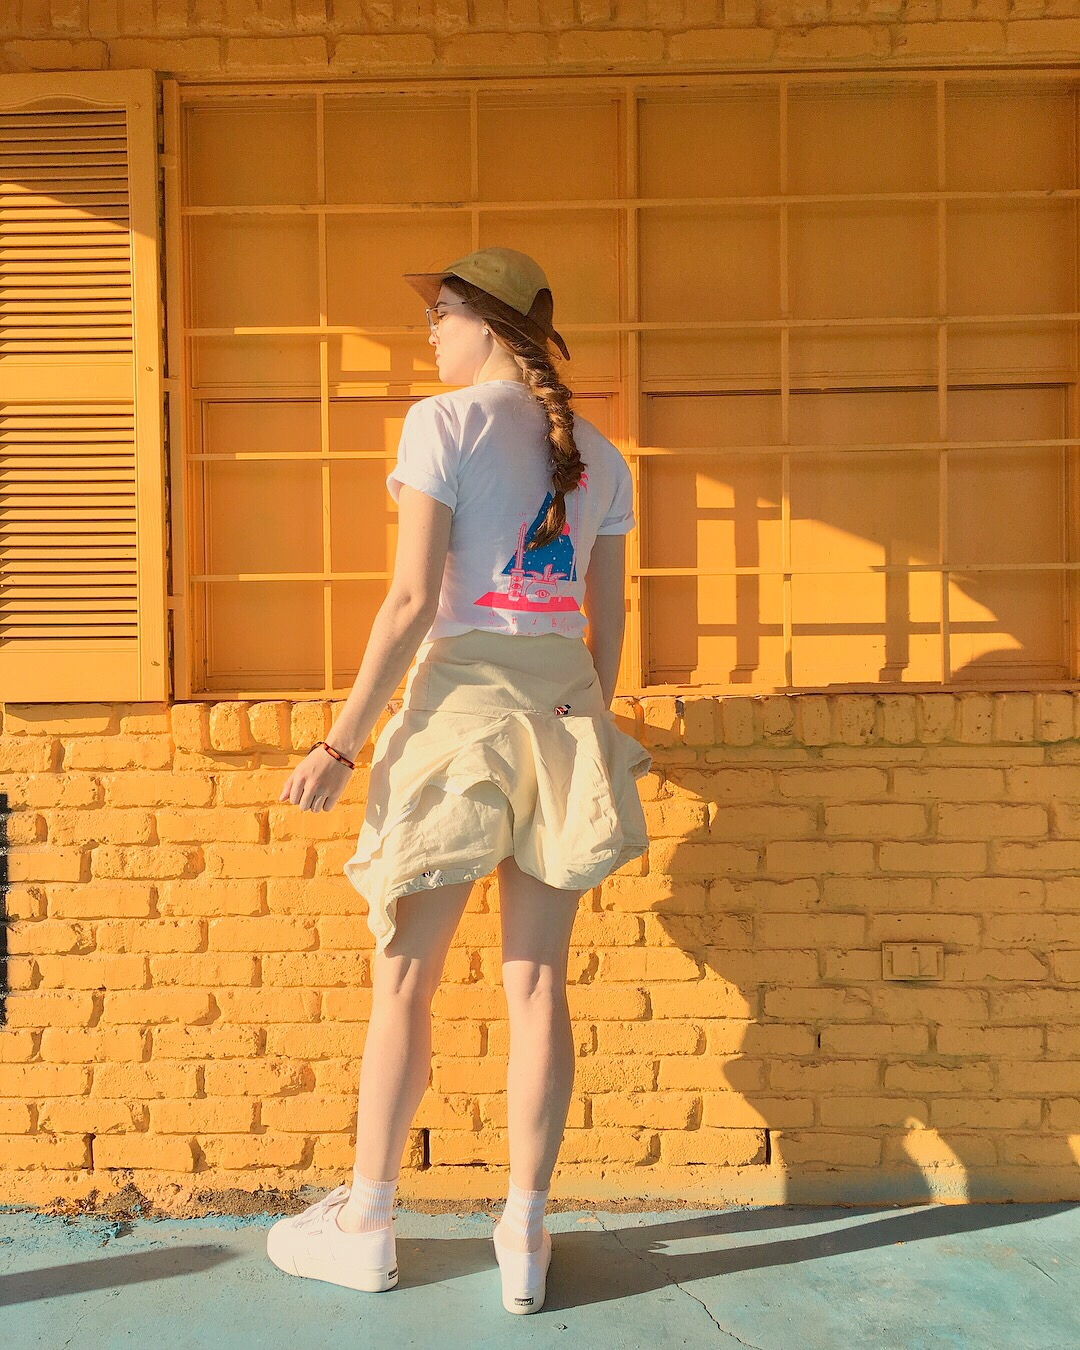 Drigo hand screen printed shirts in Deep Ellum, Dallas, Texas at the yellow house